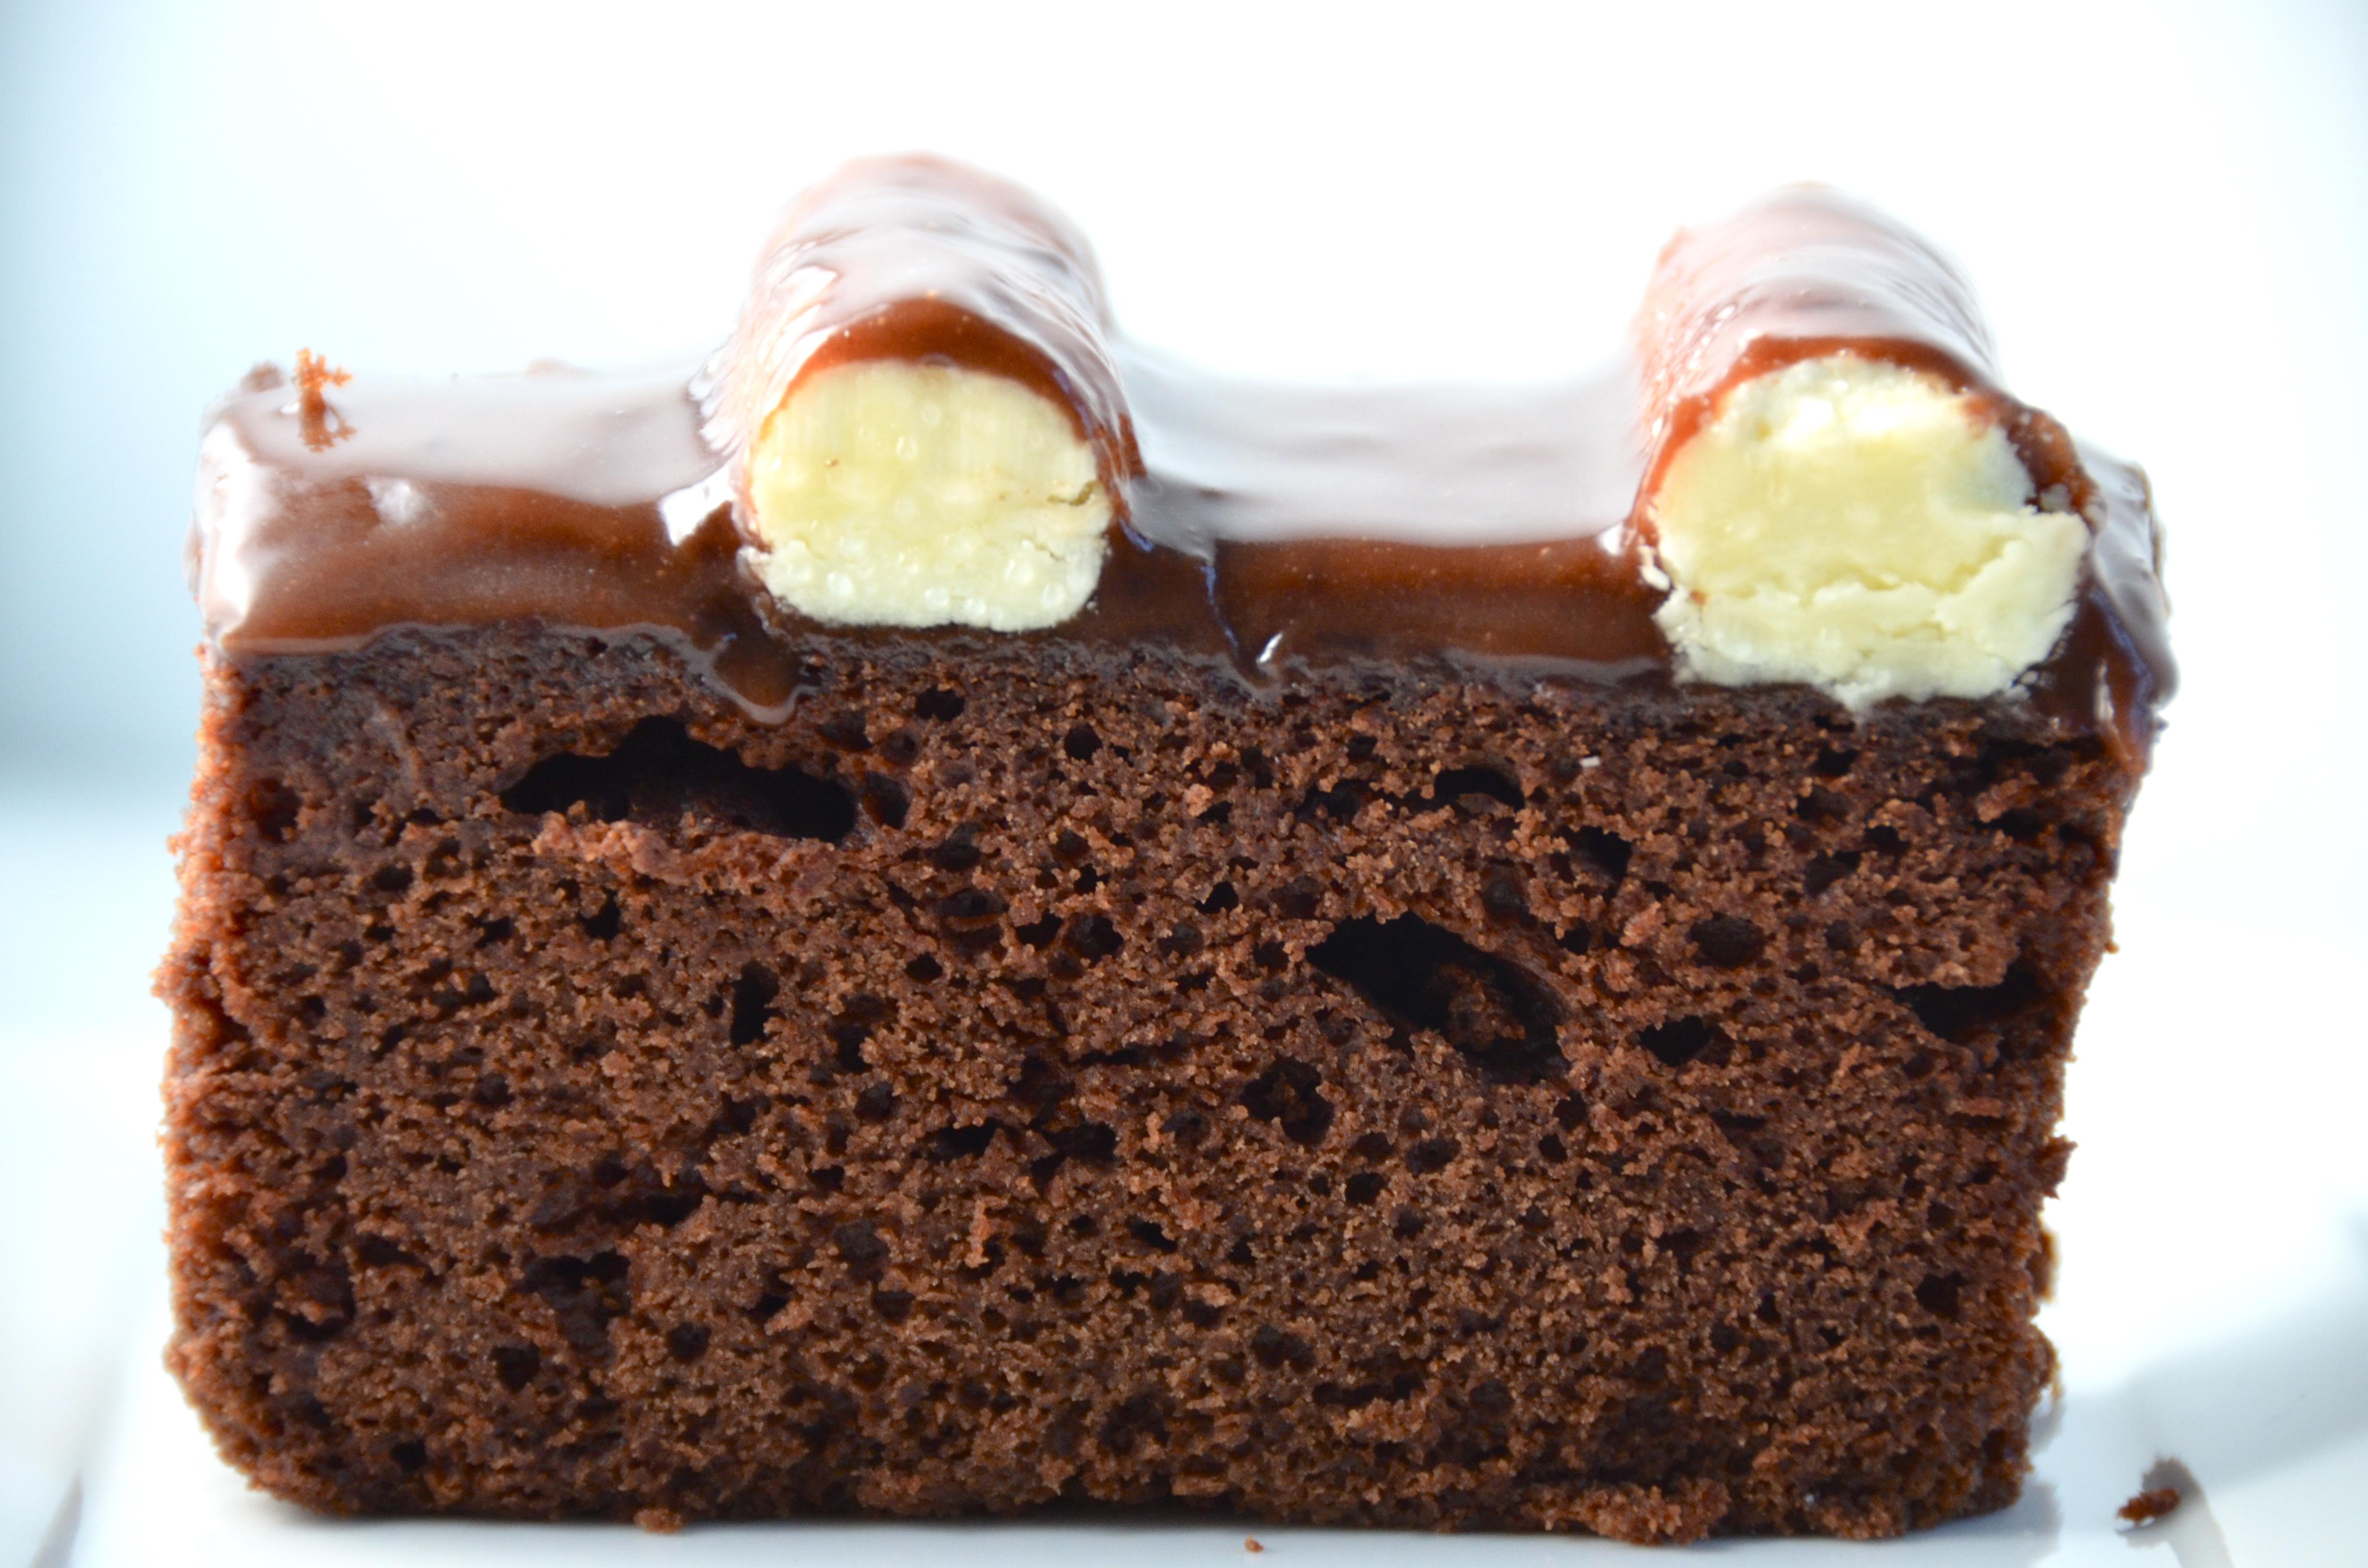 Sanders Bumpy Cake Where To Buy